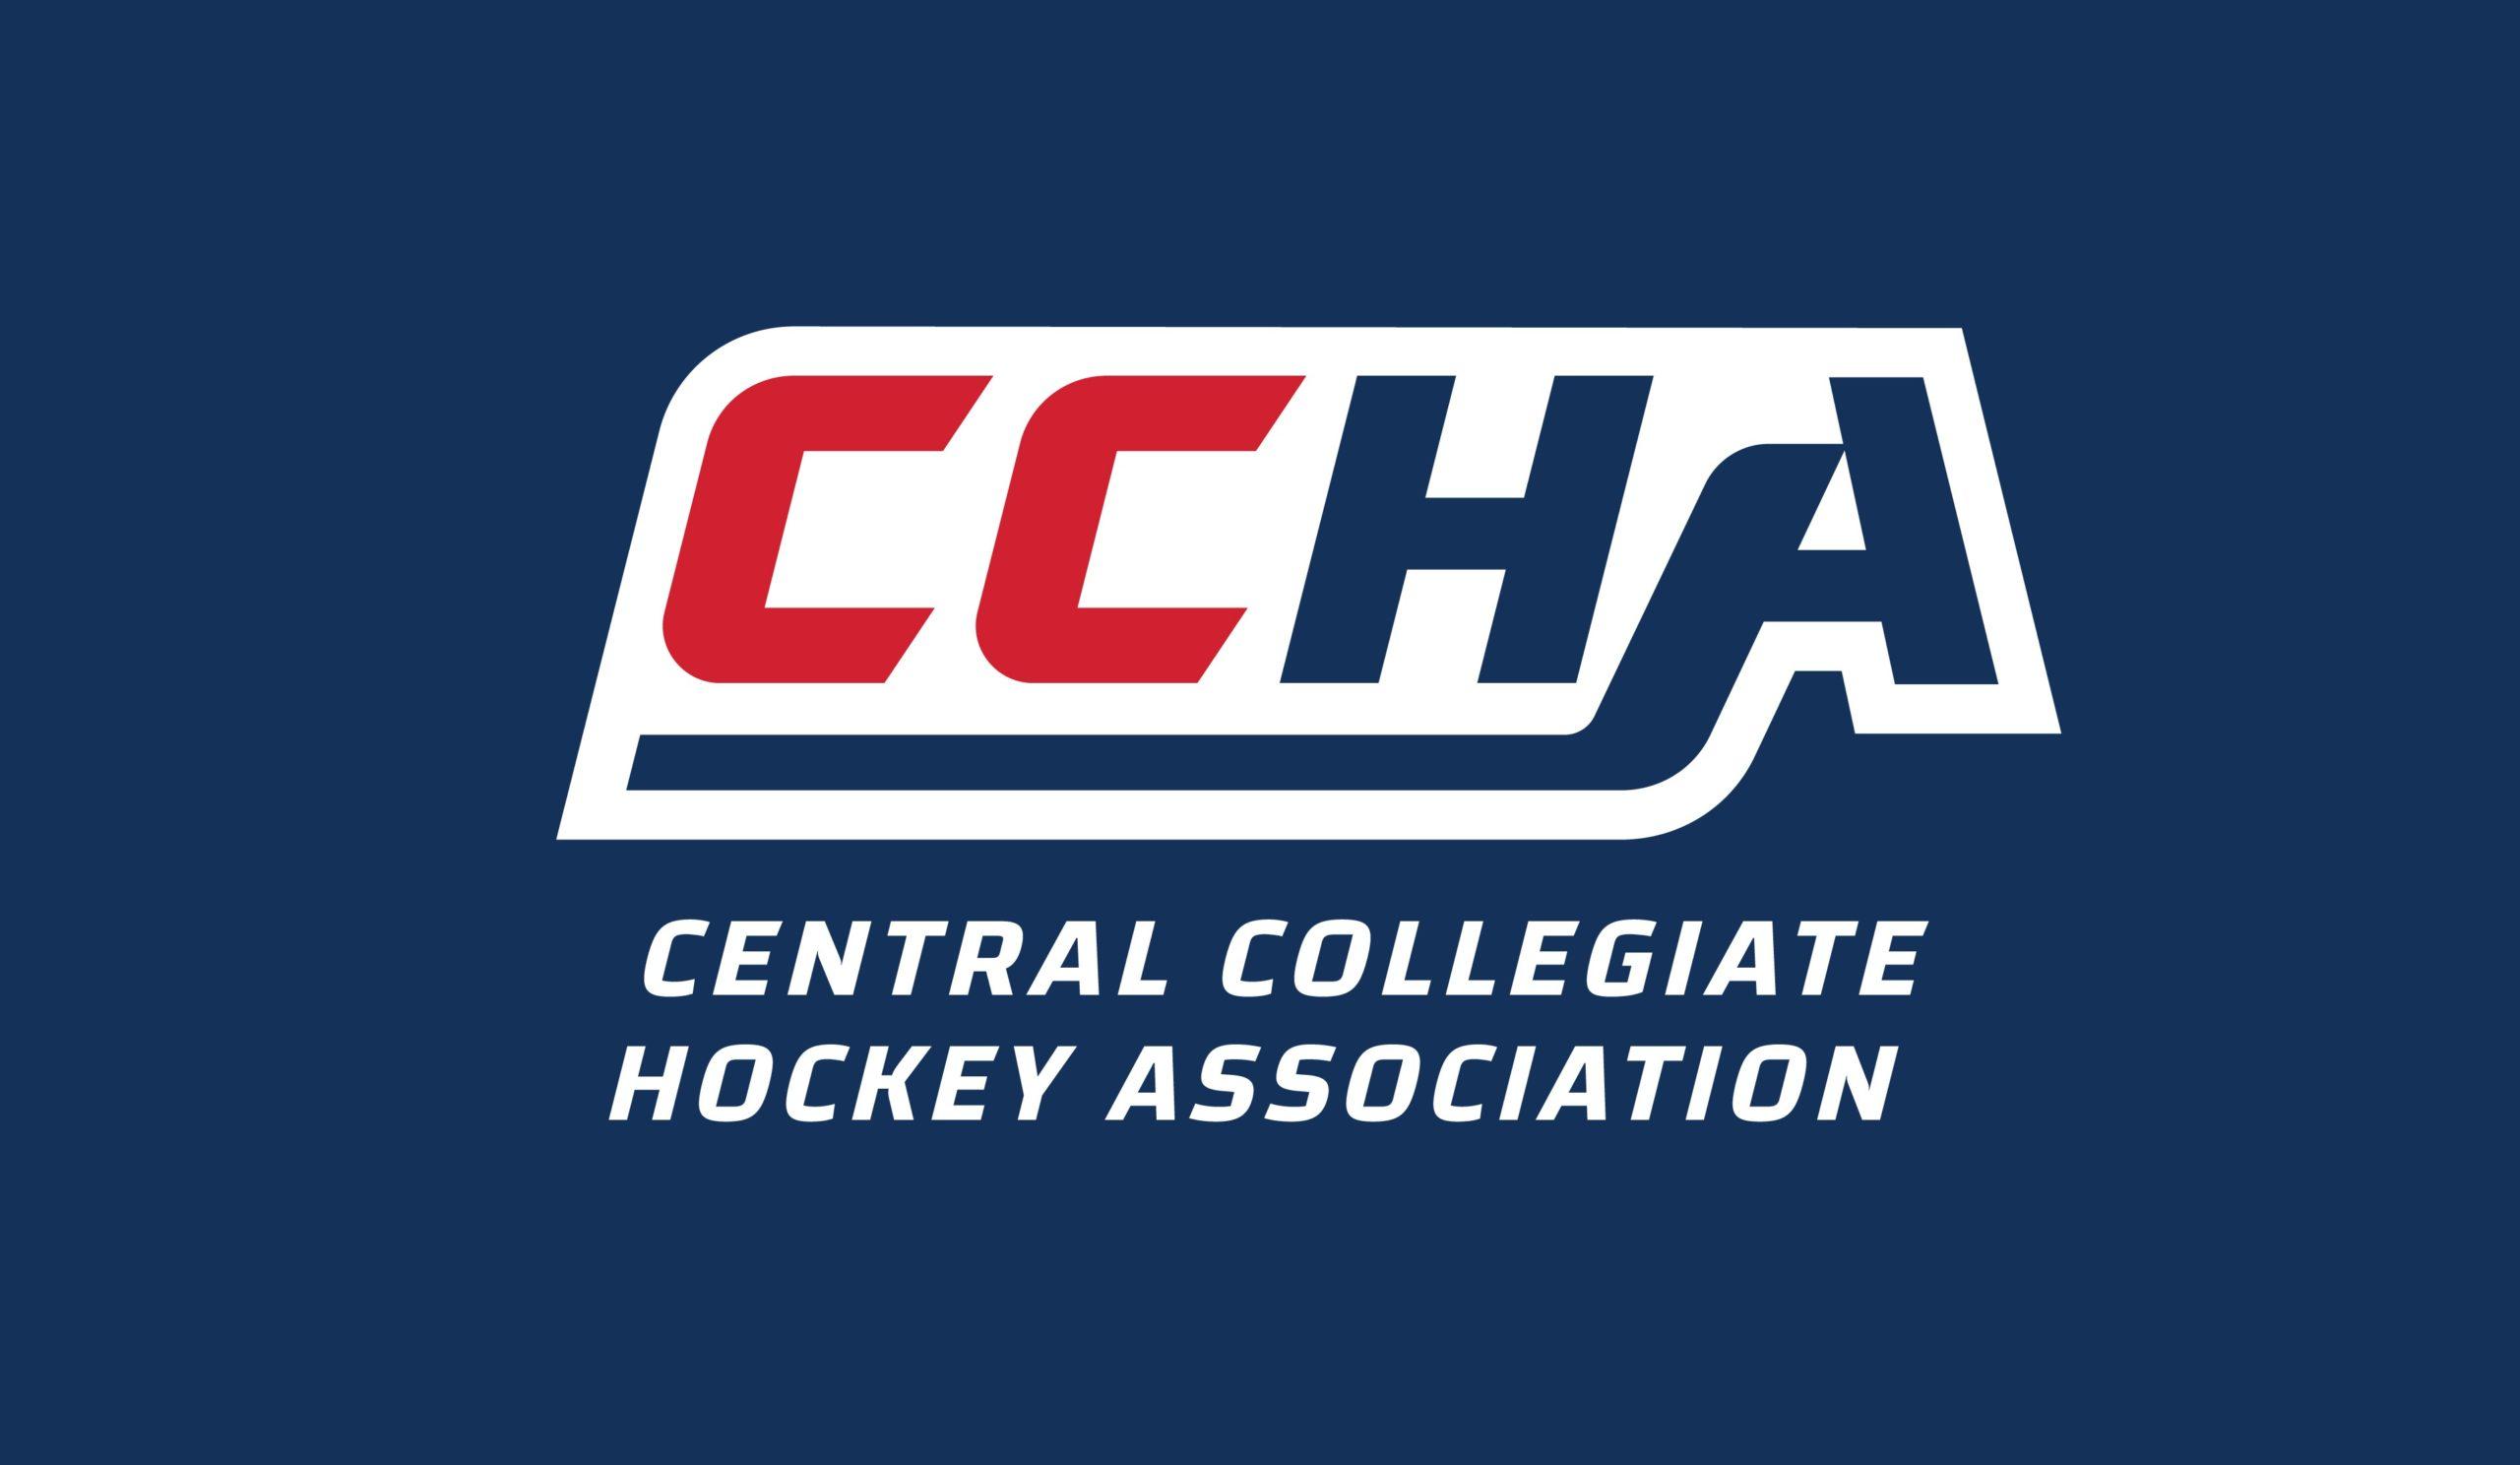 Central Collegiate Hockey Association